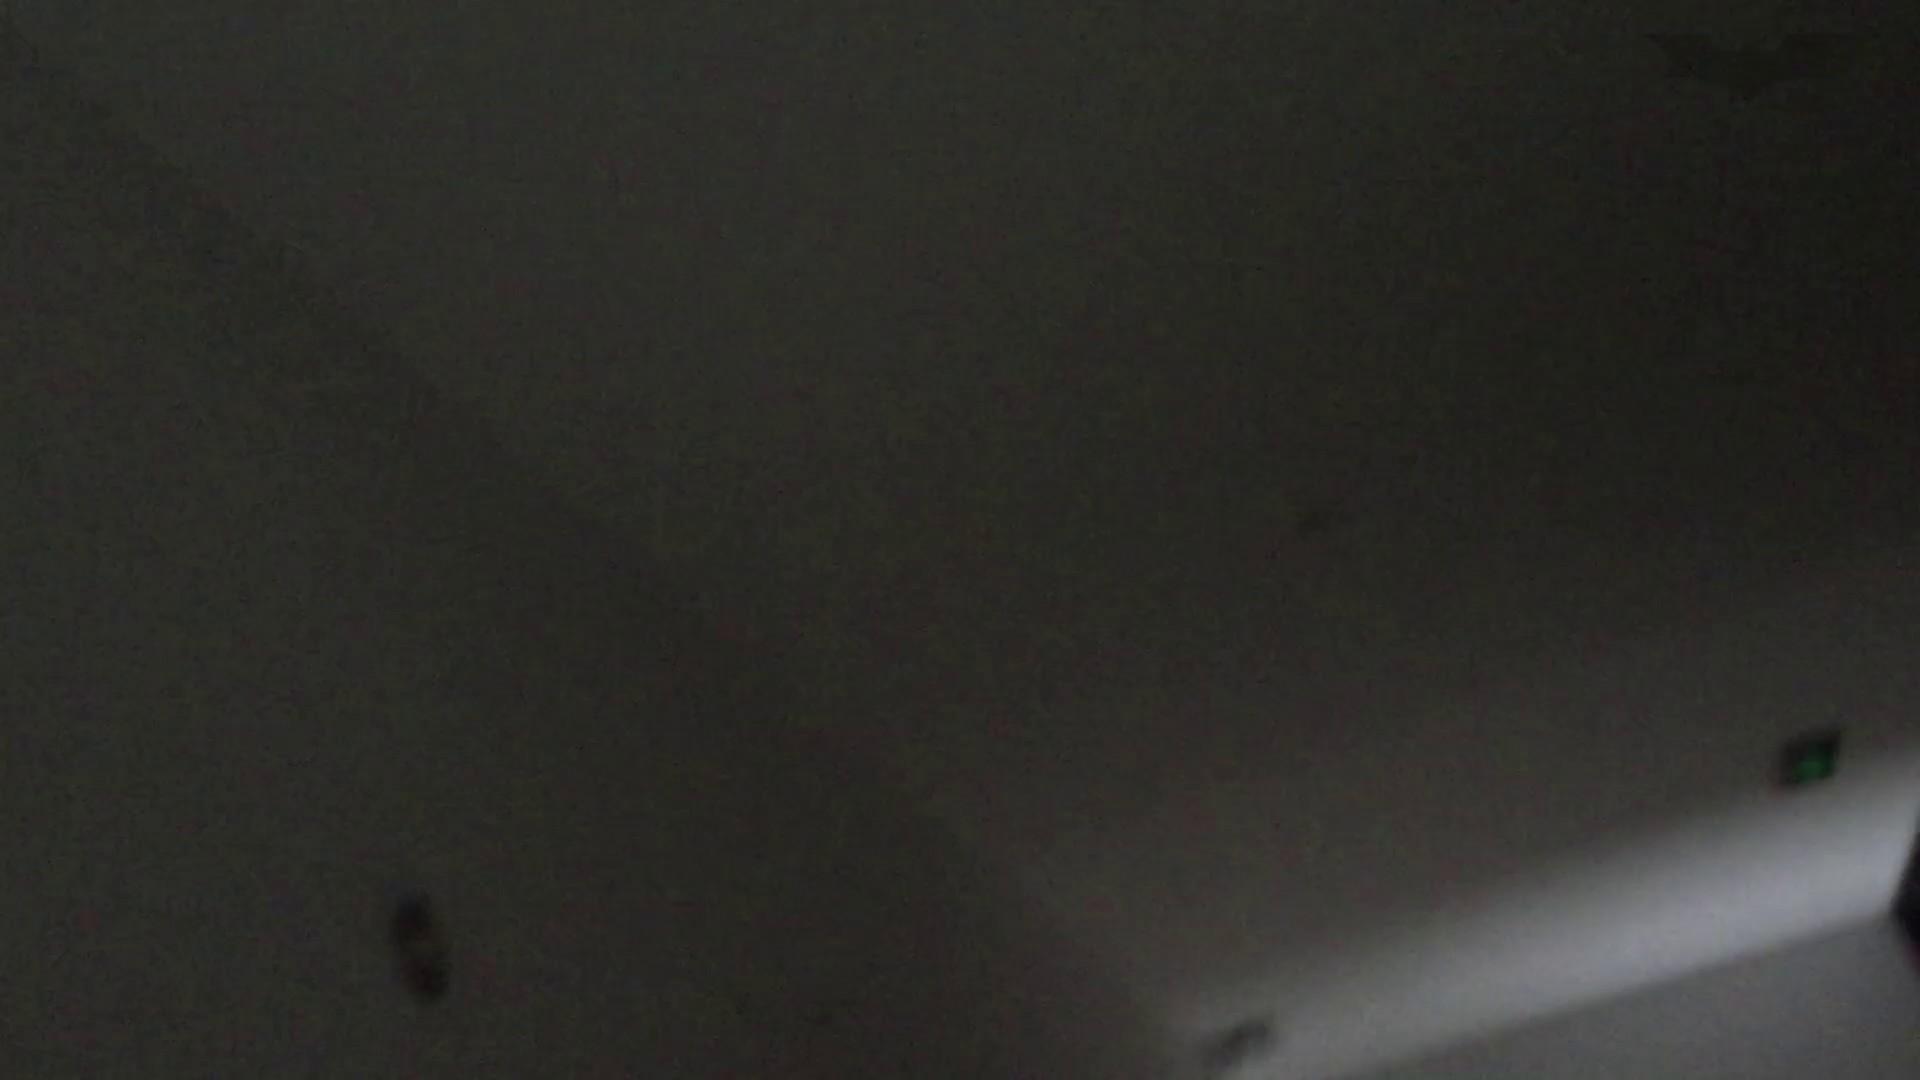 JD盗撮 美女の洗面所の秘密 Vol.74 OLの実態 盗撮ワレメ無修正動画無料 91pic 27